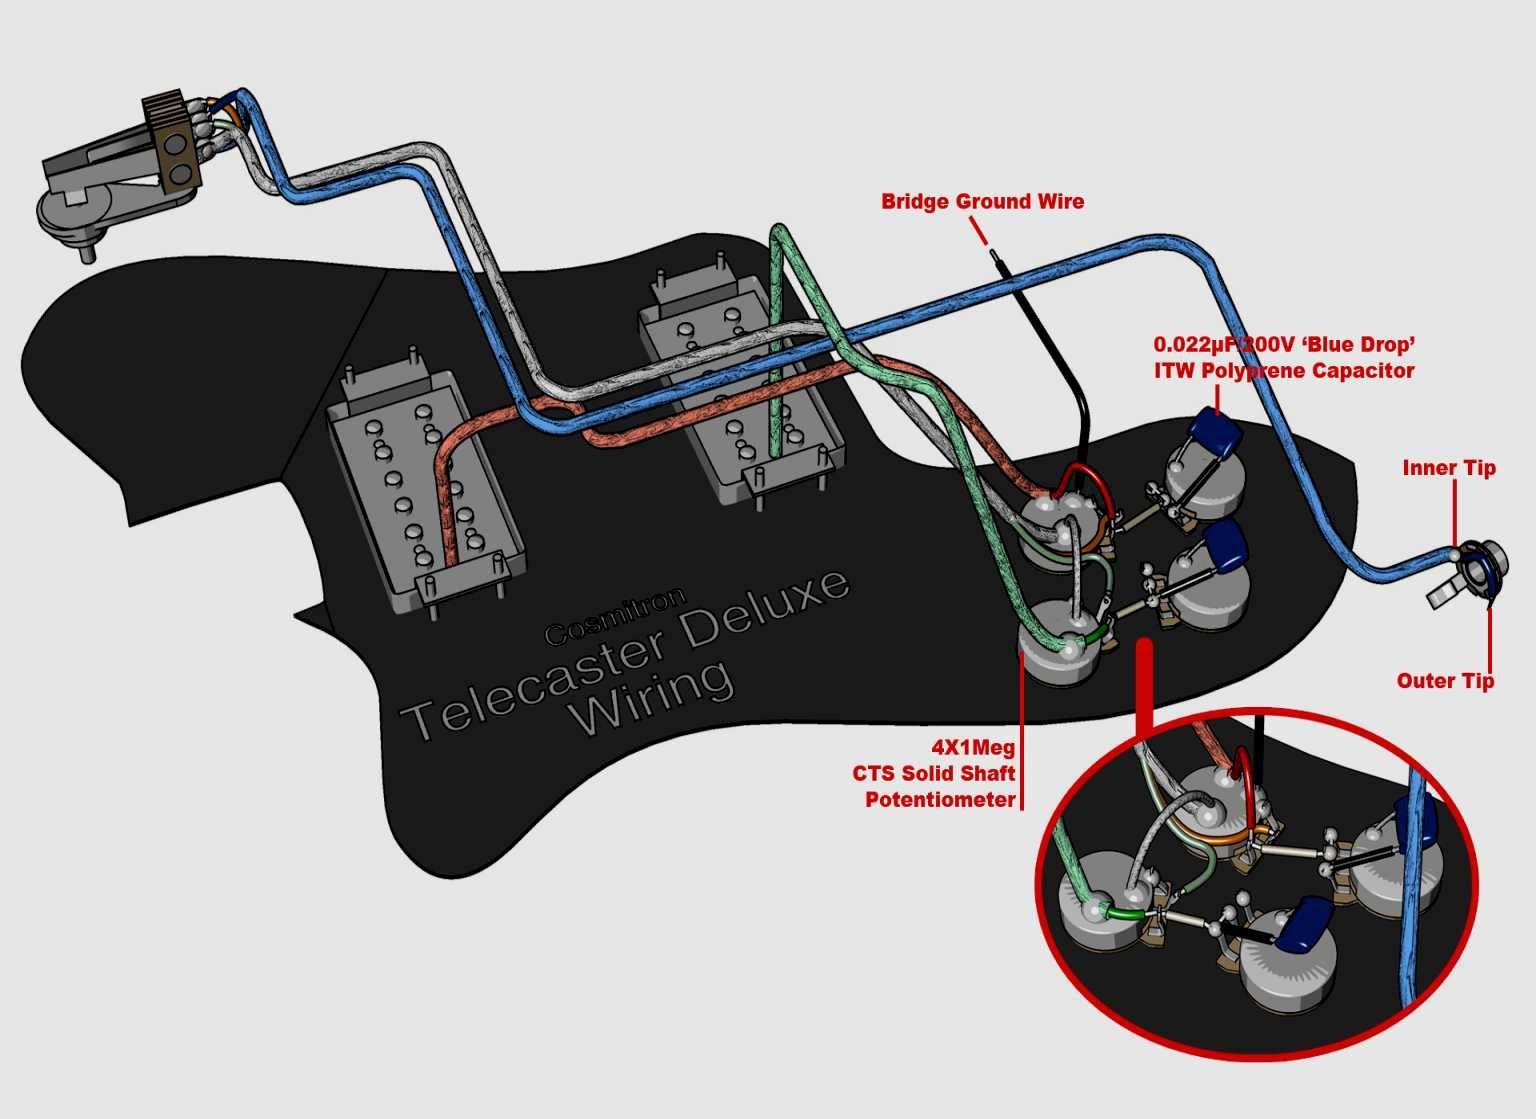 Pin By Bookingritzcarlton Wiring Diag On Aprendendo Musica Telecaster Custom Telecaster Diagram Design